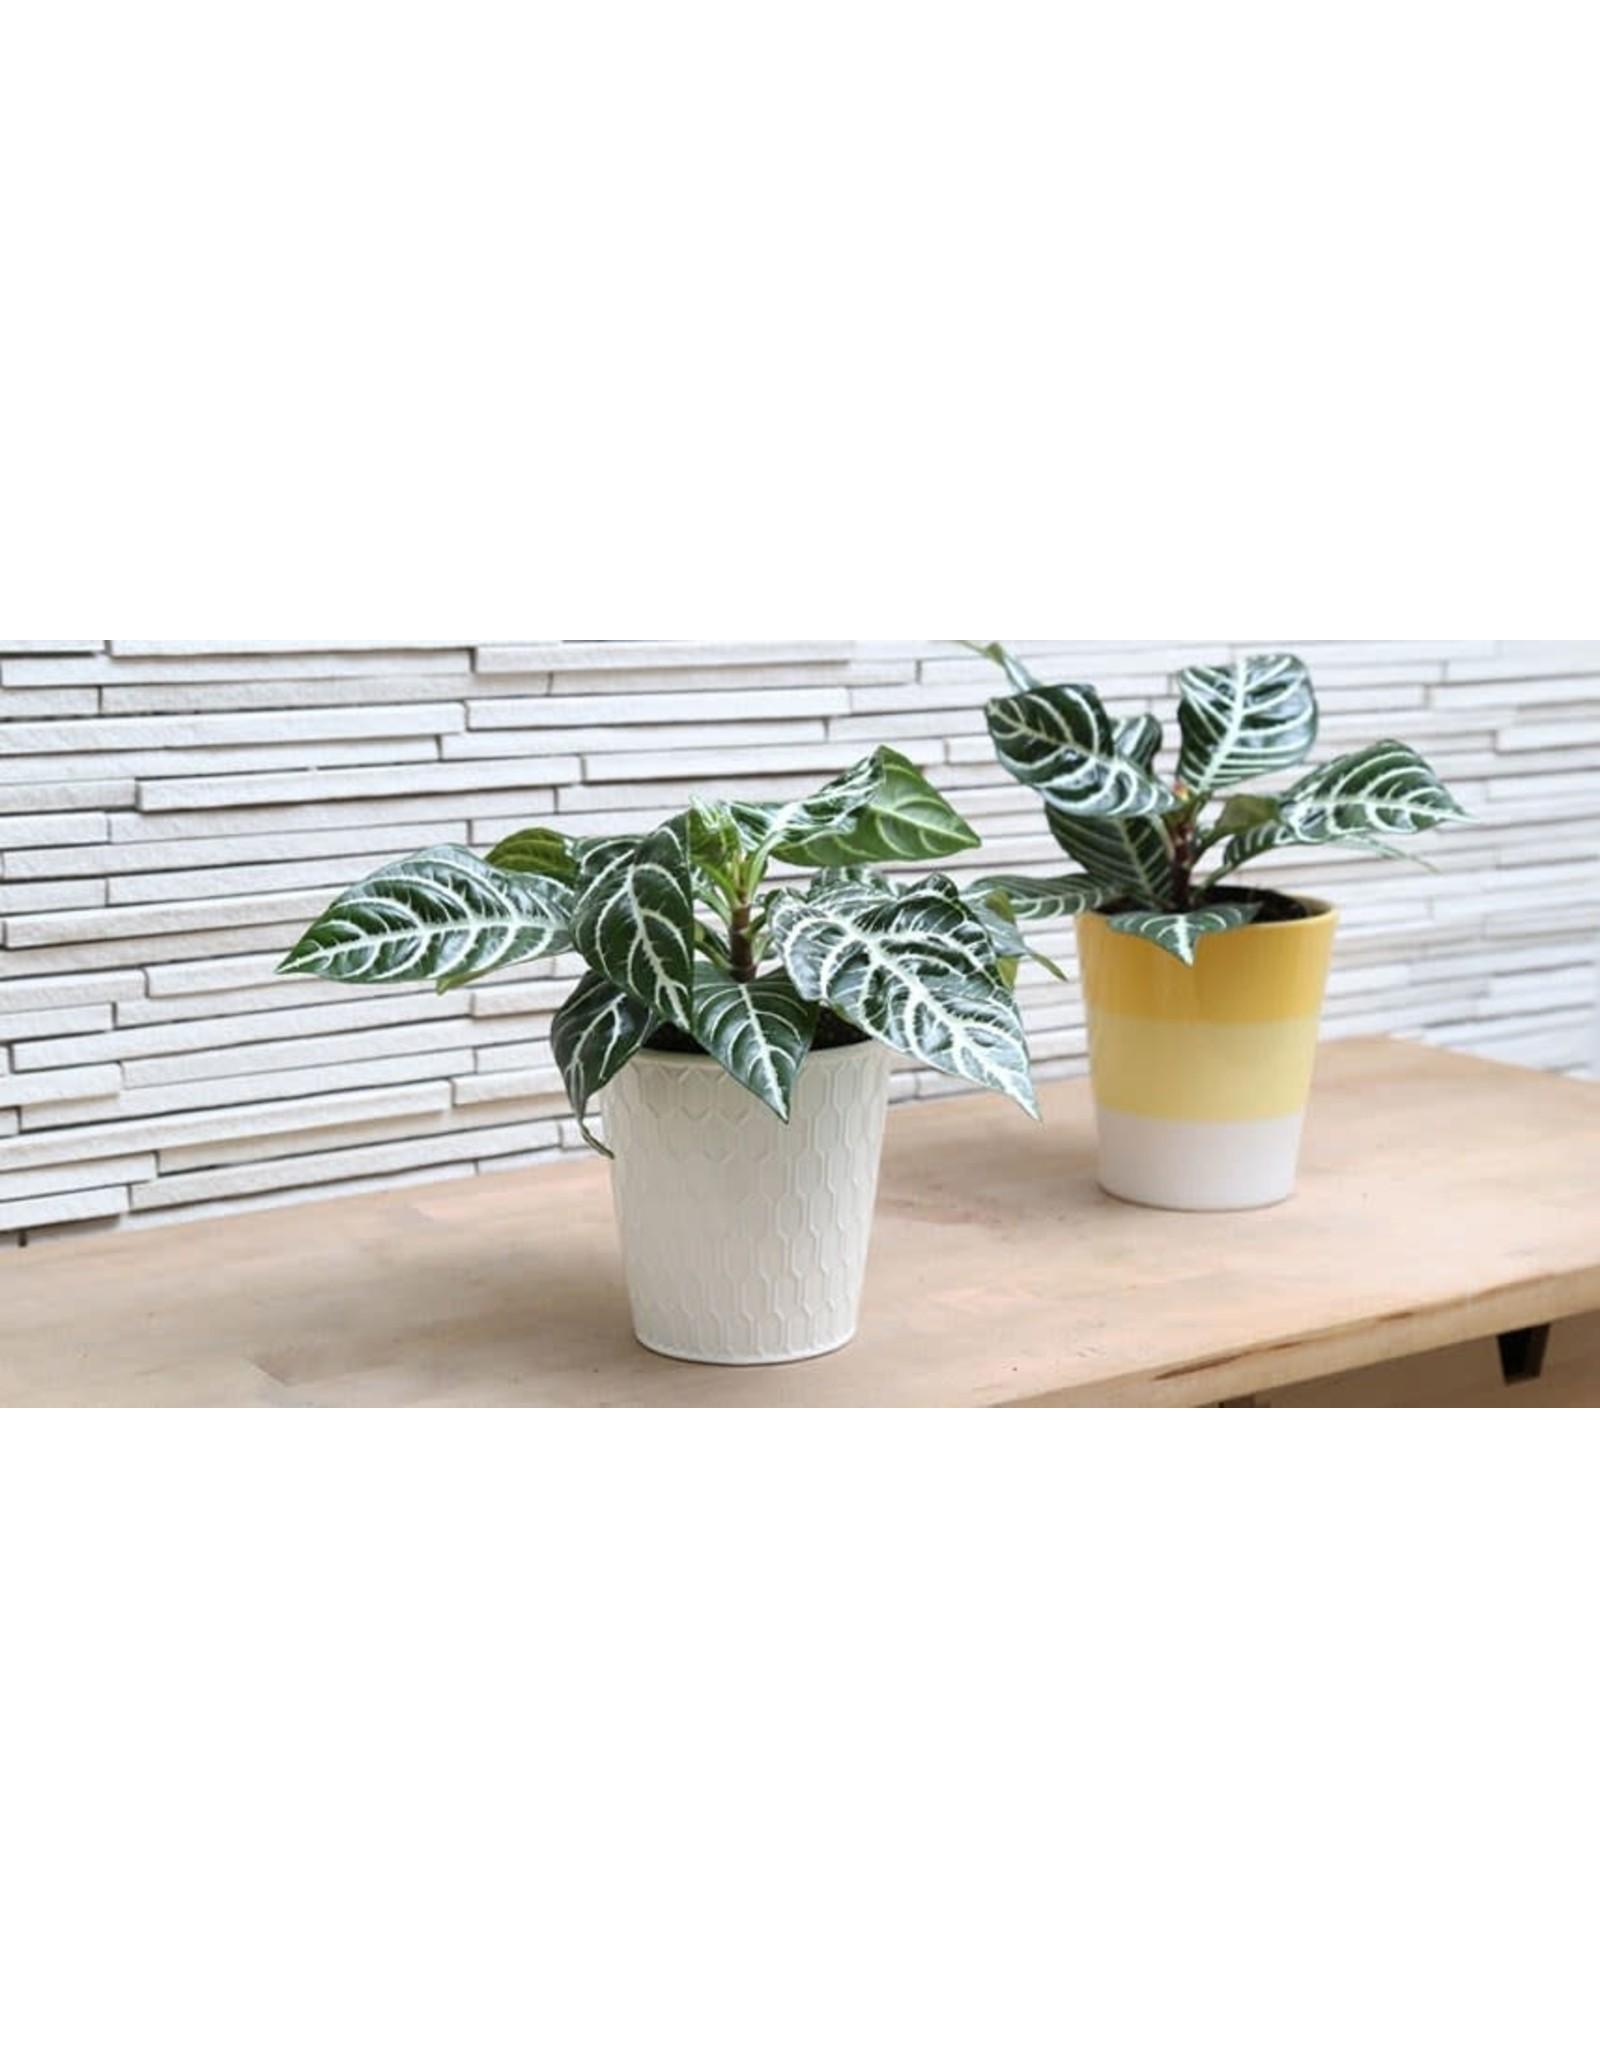 "Zebra Plant - Aphelandra 'Snow White' 4"""